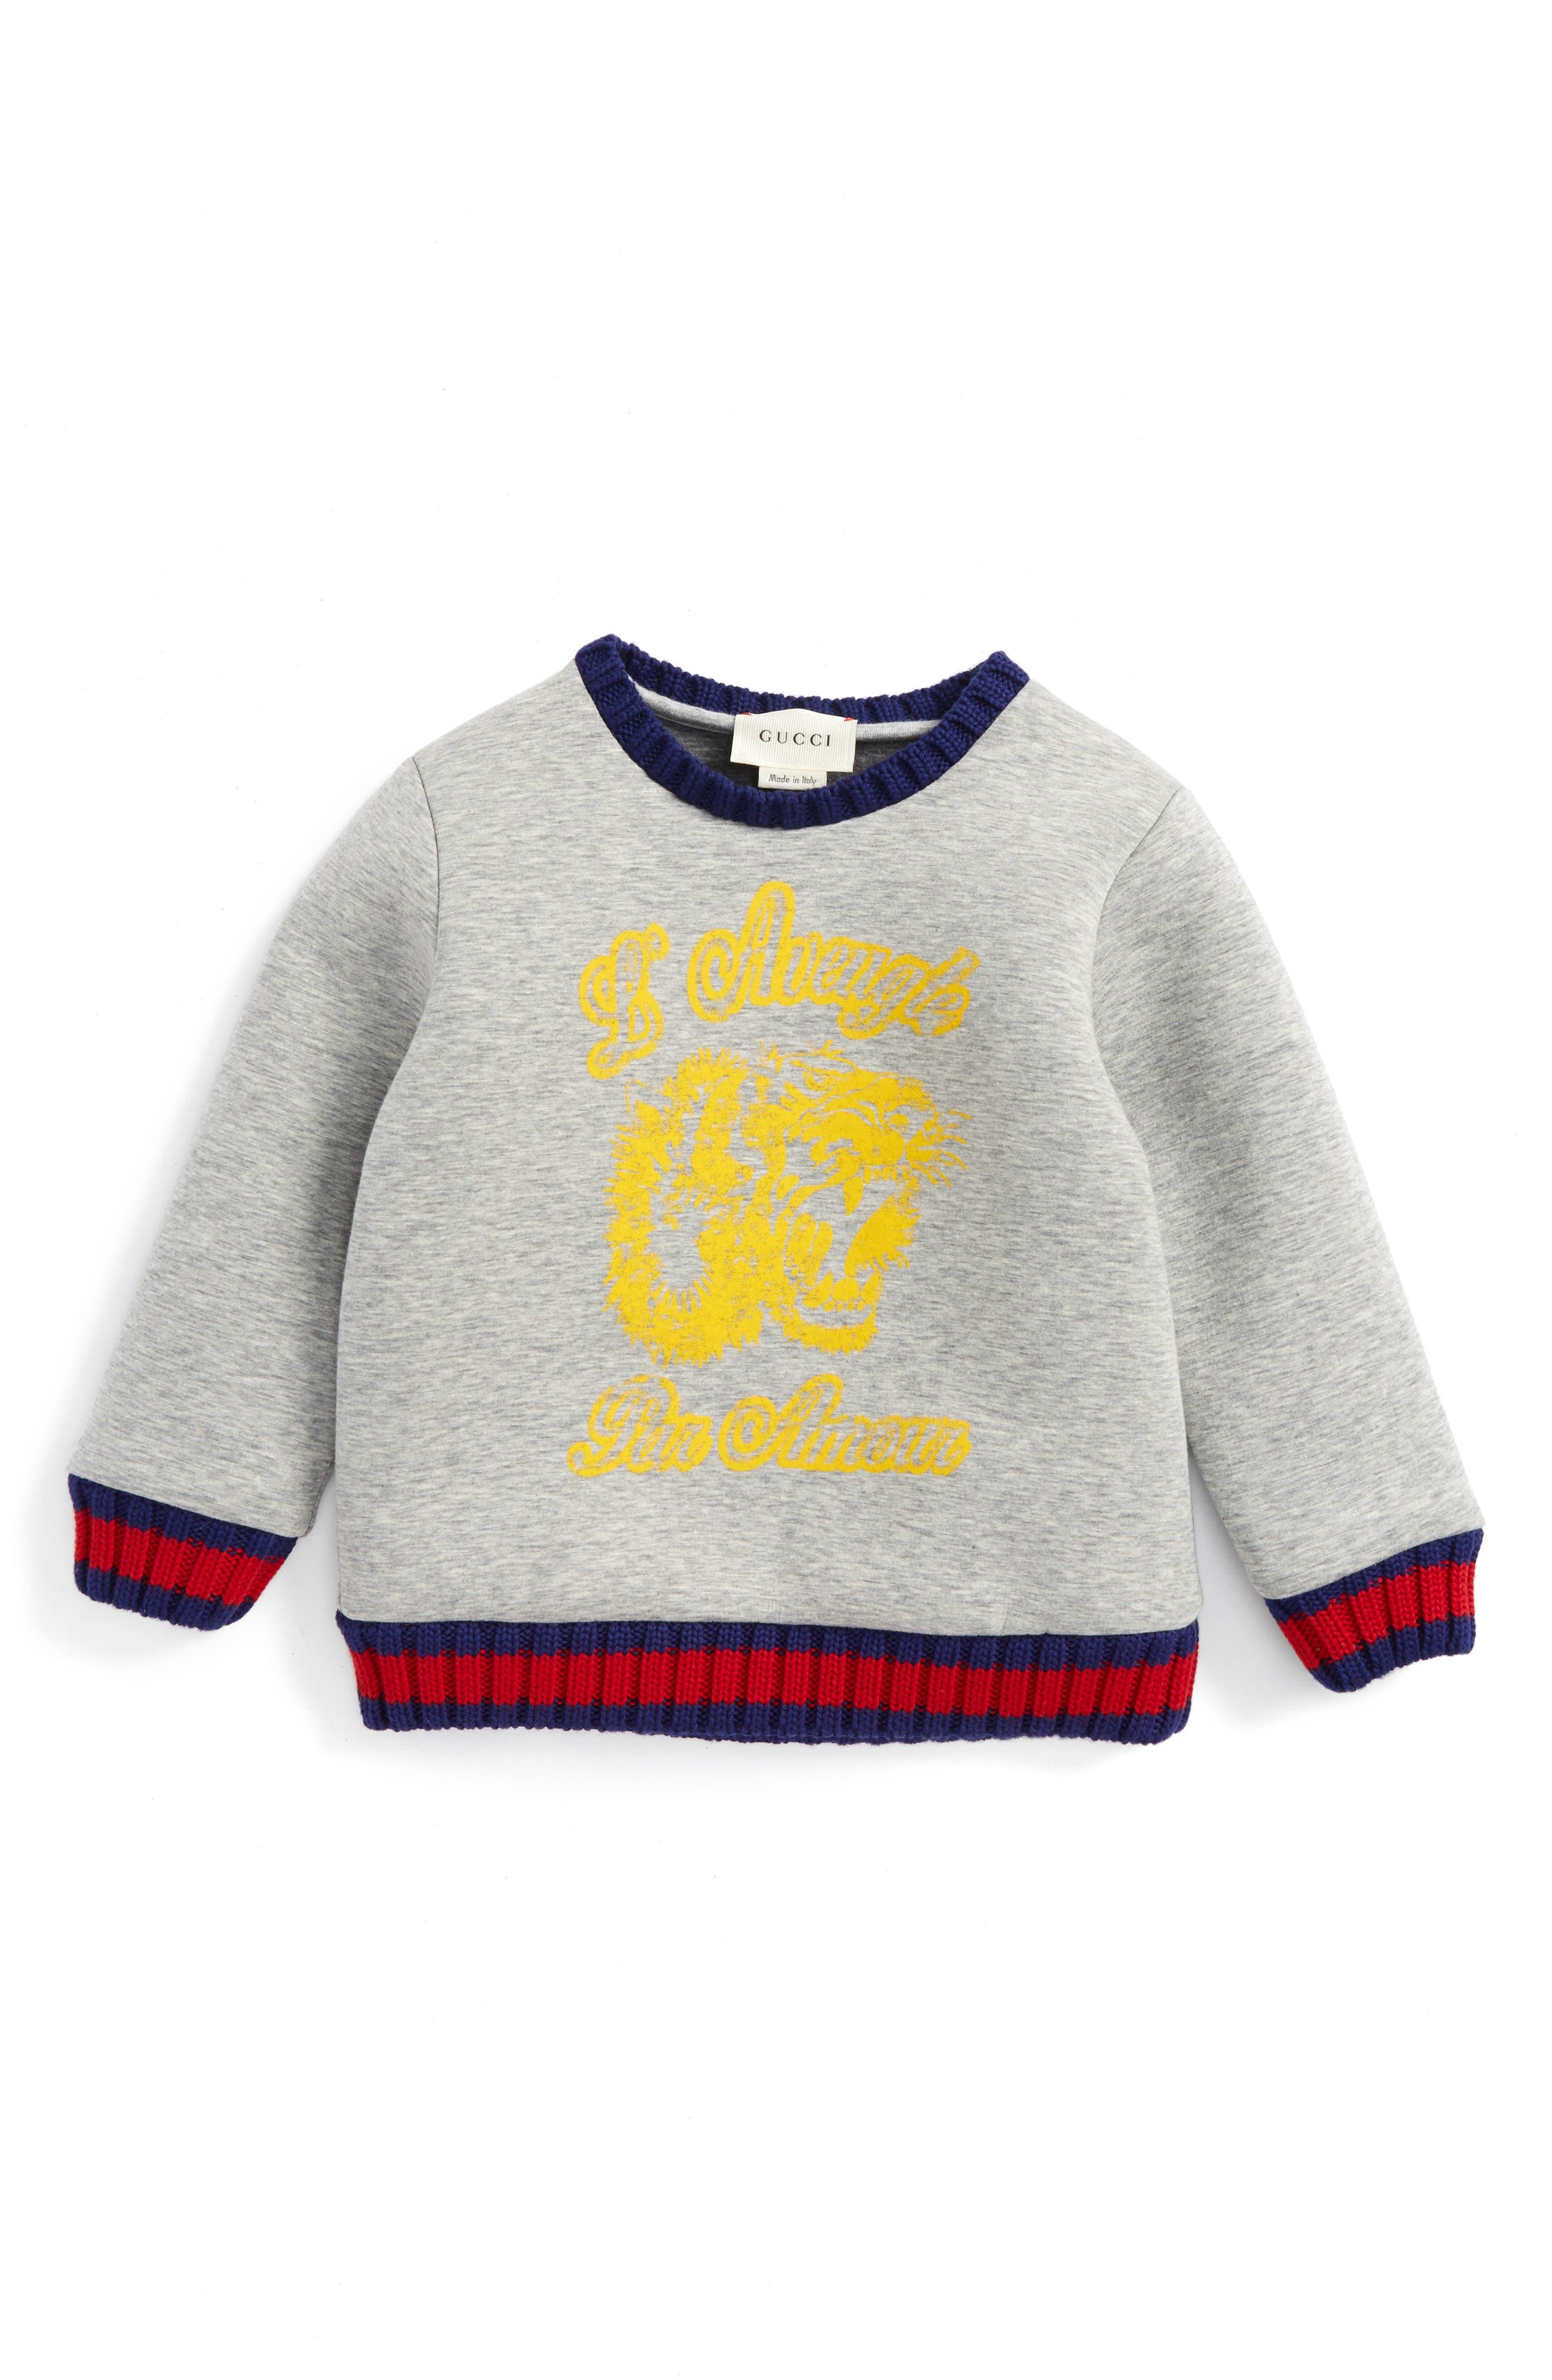 GUCCI Web Tiger Graphic Sweatshirt